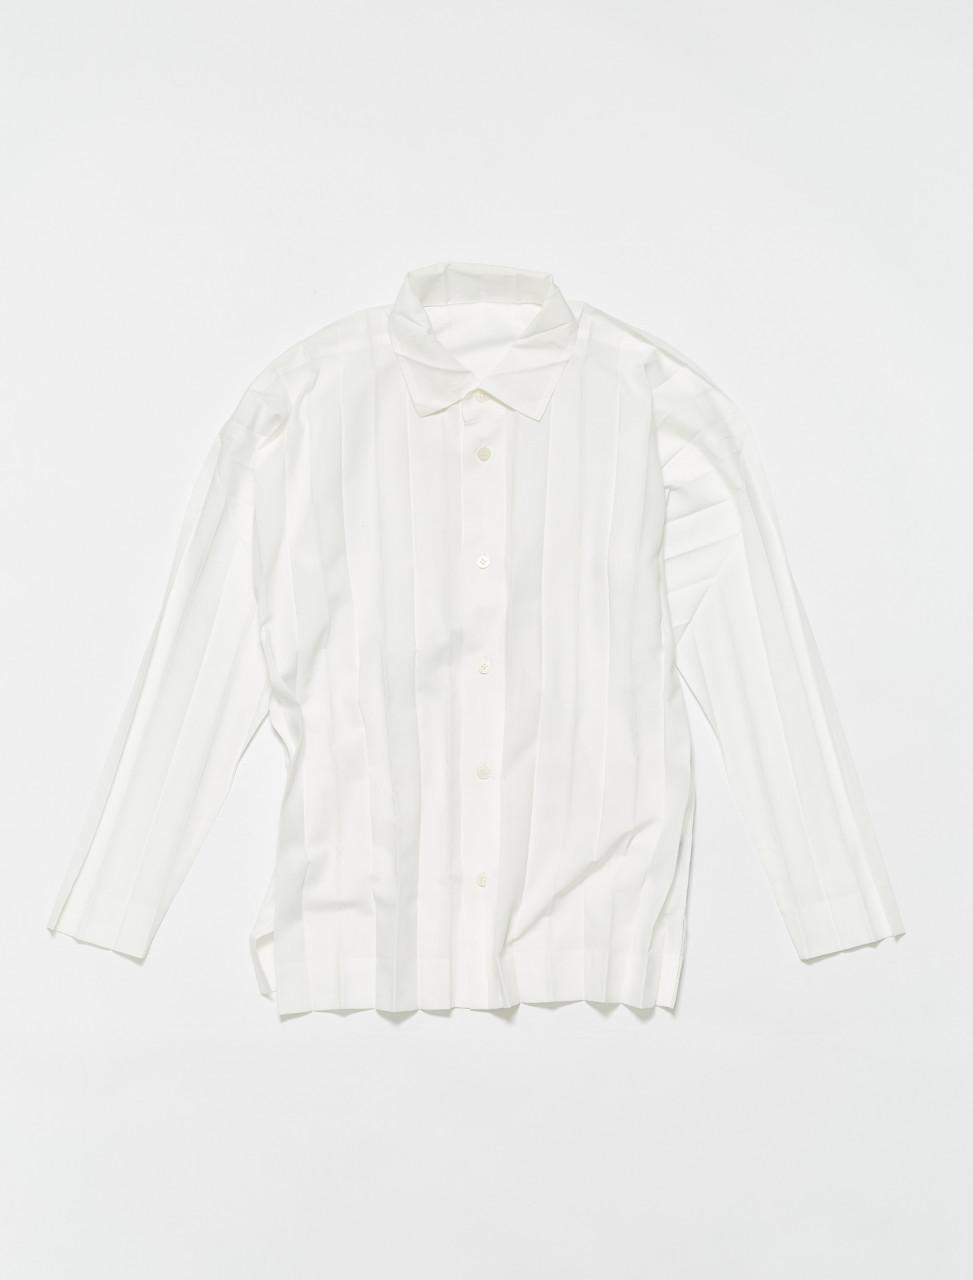 HP17FJ005-01 HOMME PLISSE ISSEY MIYAKE HP17 FL005 PLEATED SHIRT WHITE